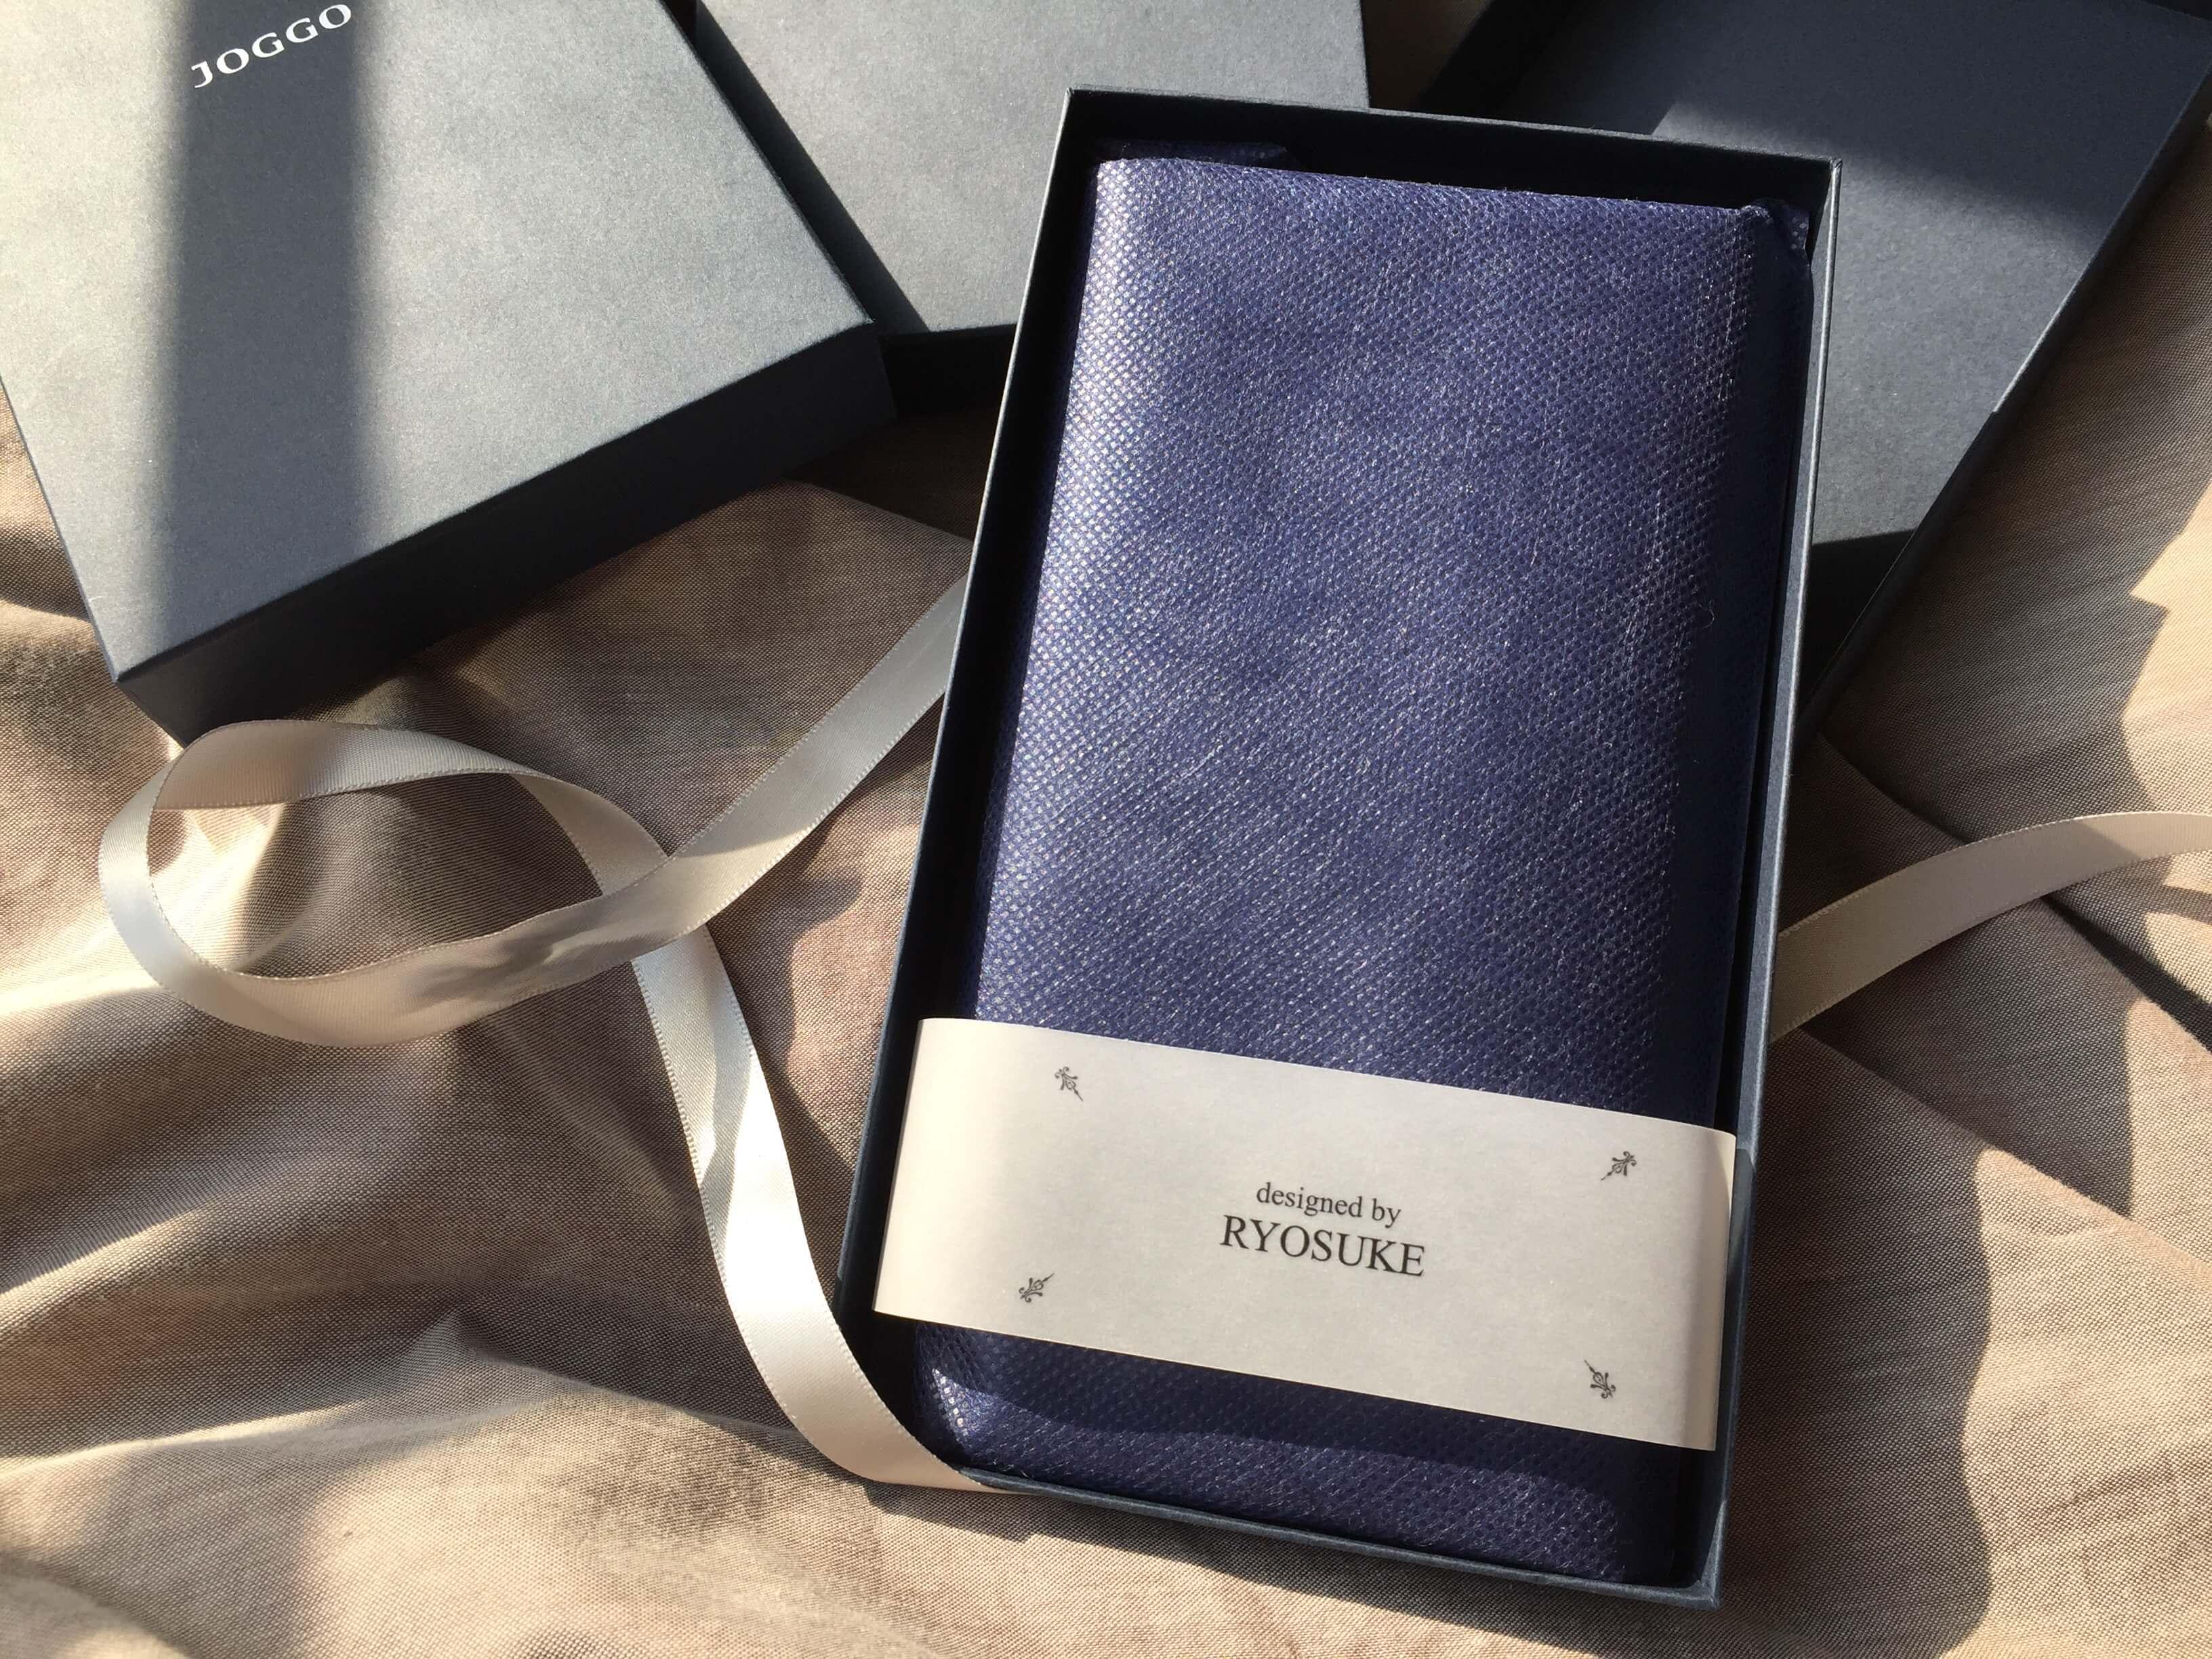 JOGGOの本皮長財布のラッピング写真